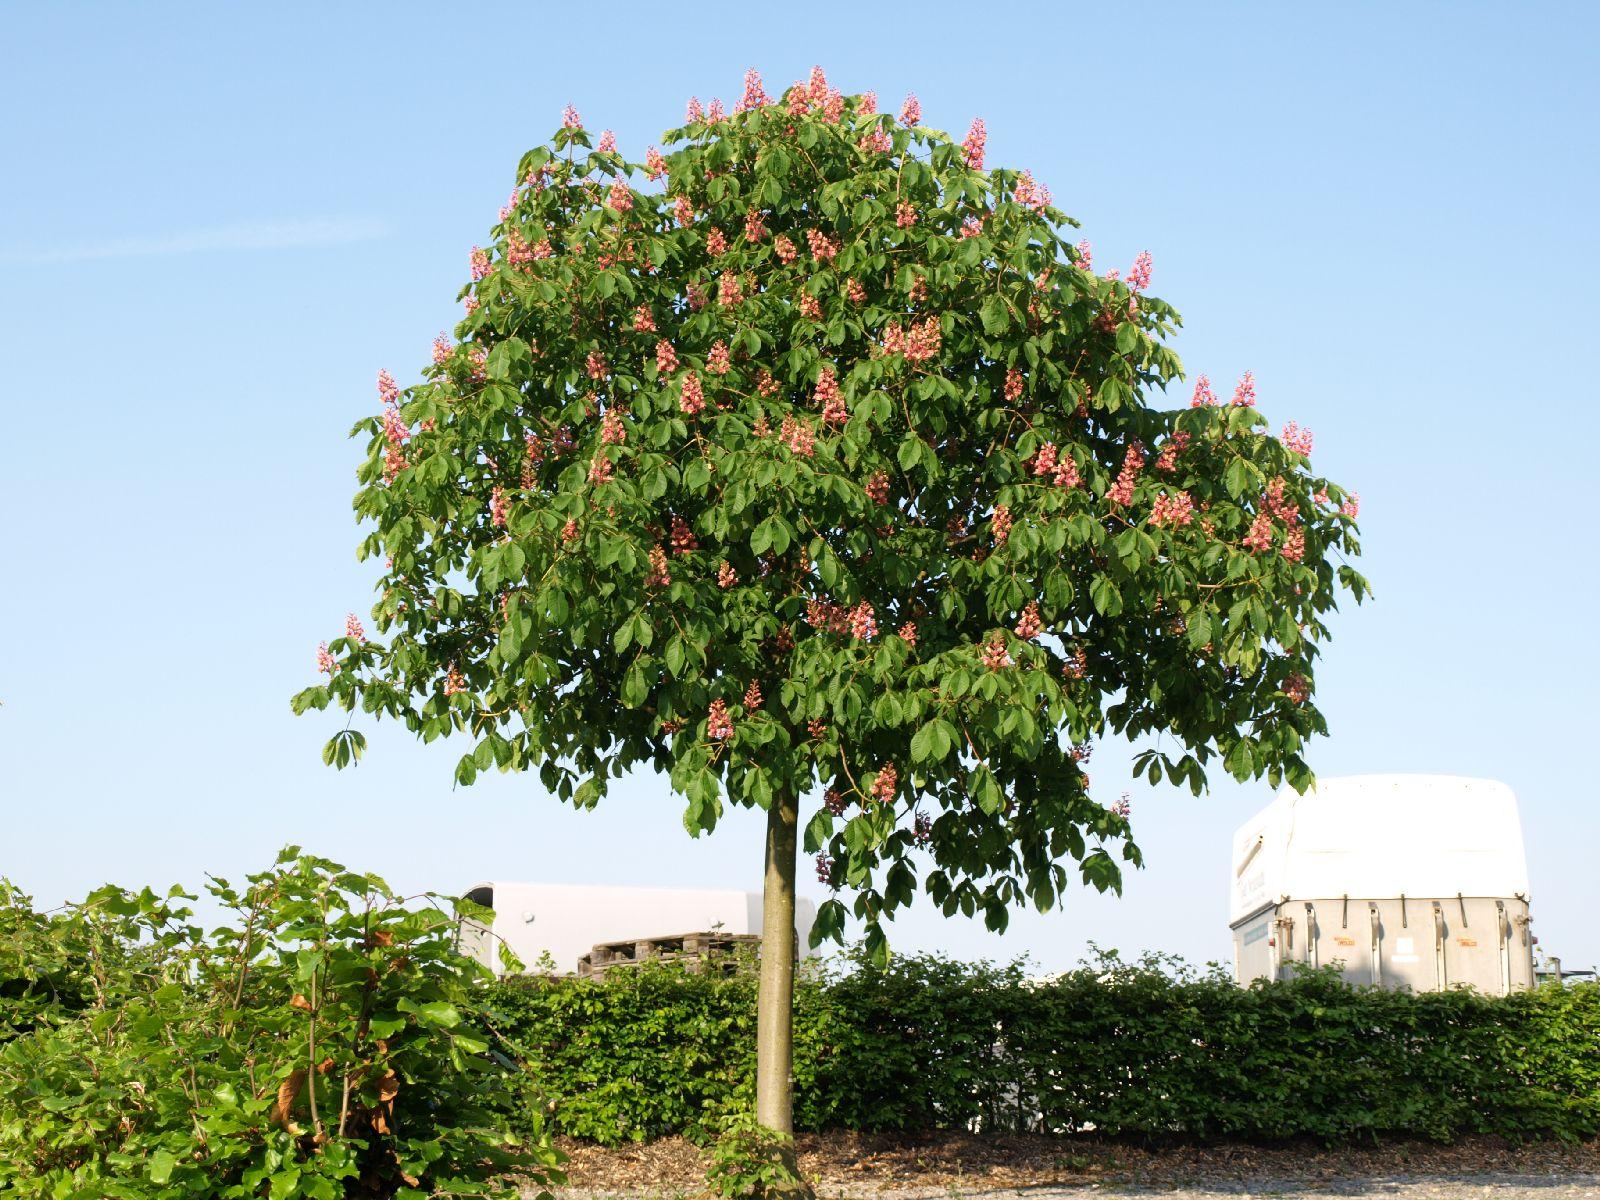 Plants-Trees_Photo_Texture_B_P5142754